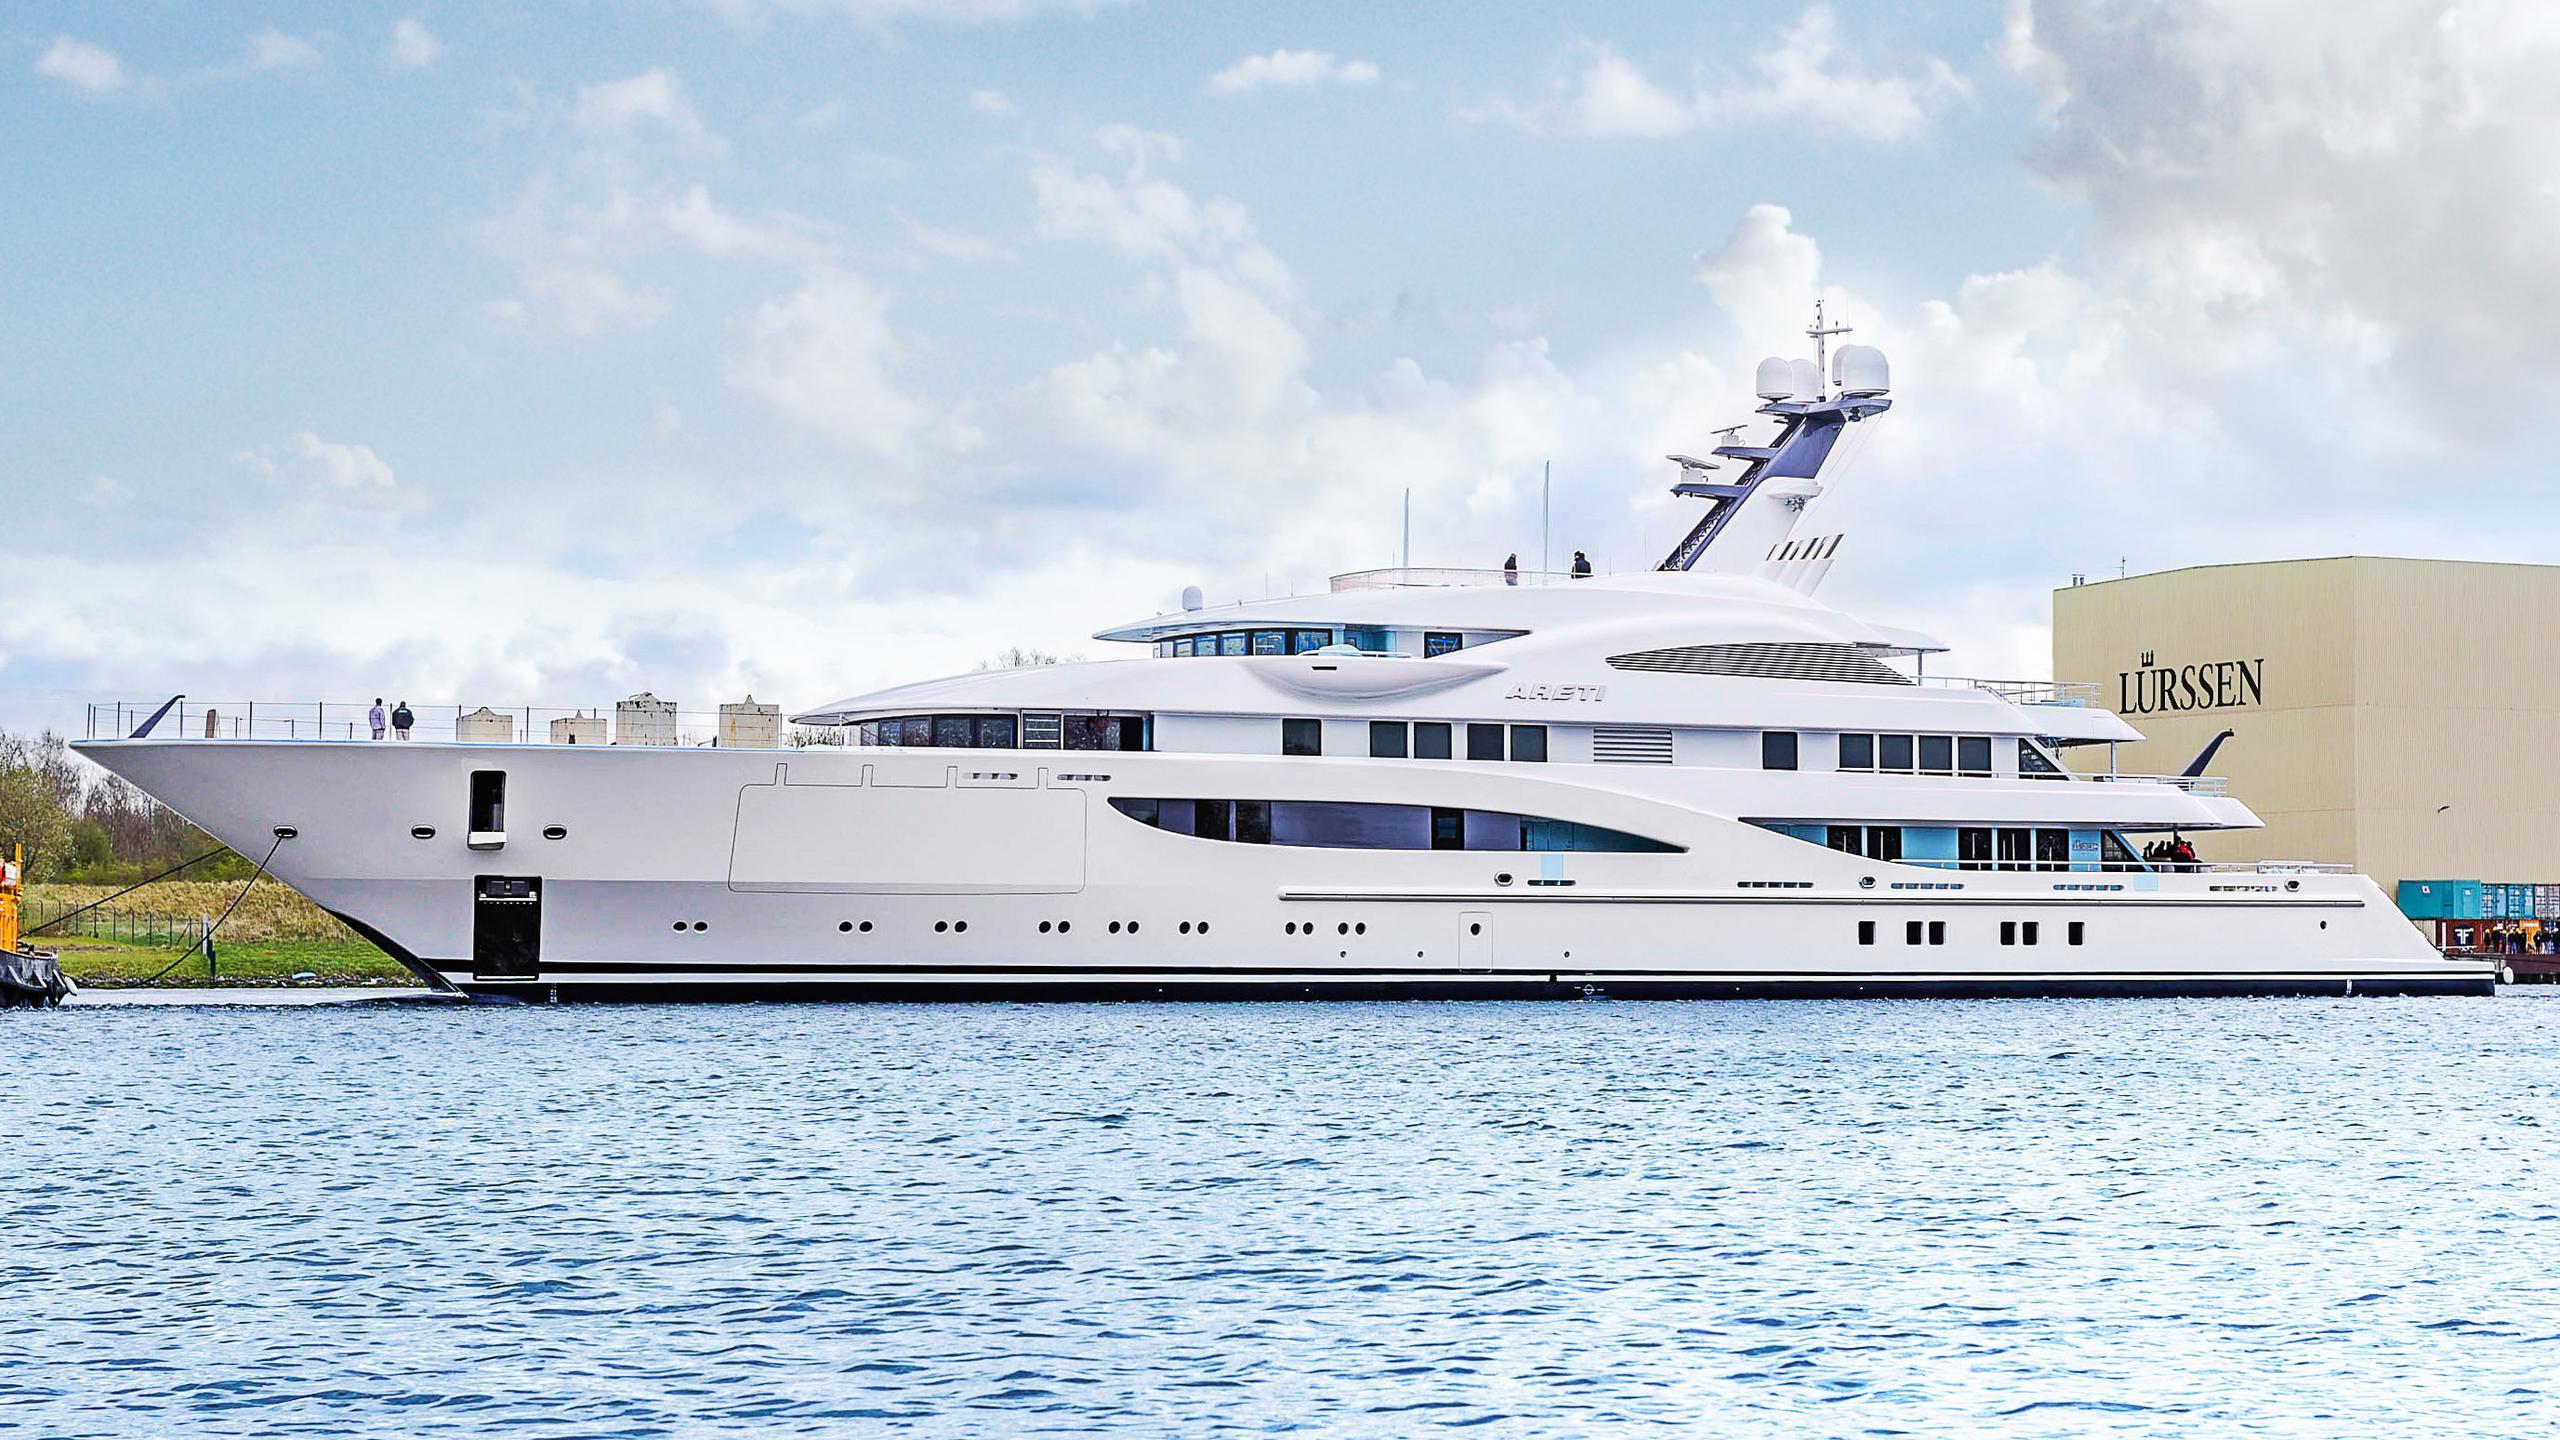 areti sasha motoryacht lurssen 85m 2017 launch profile